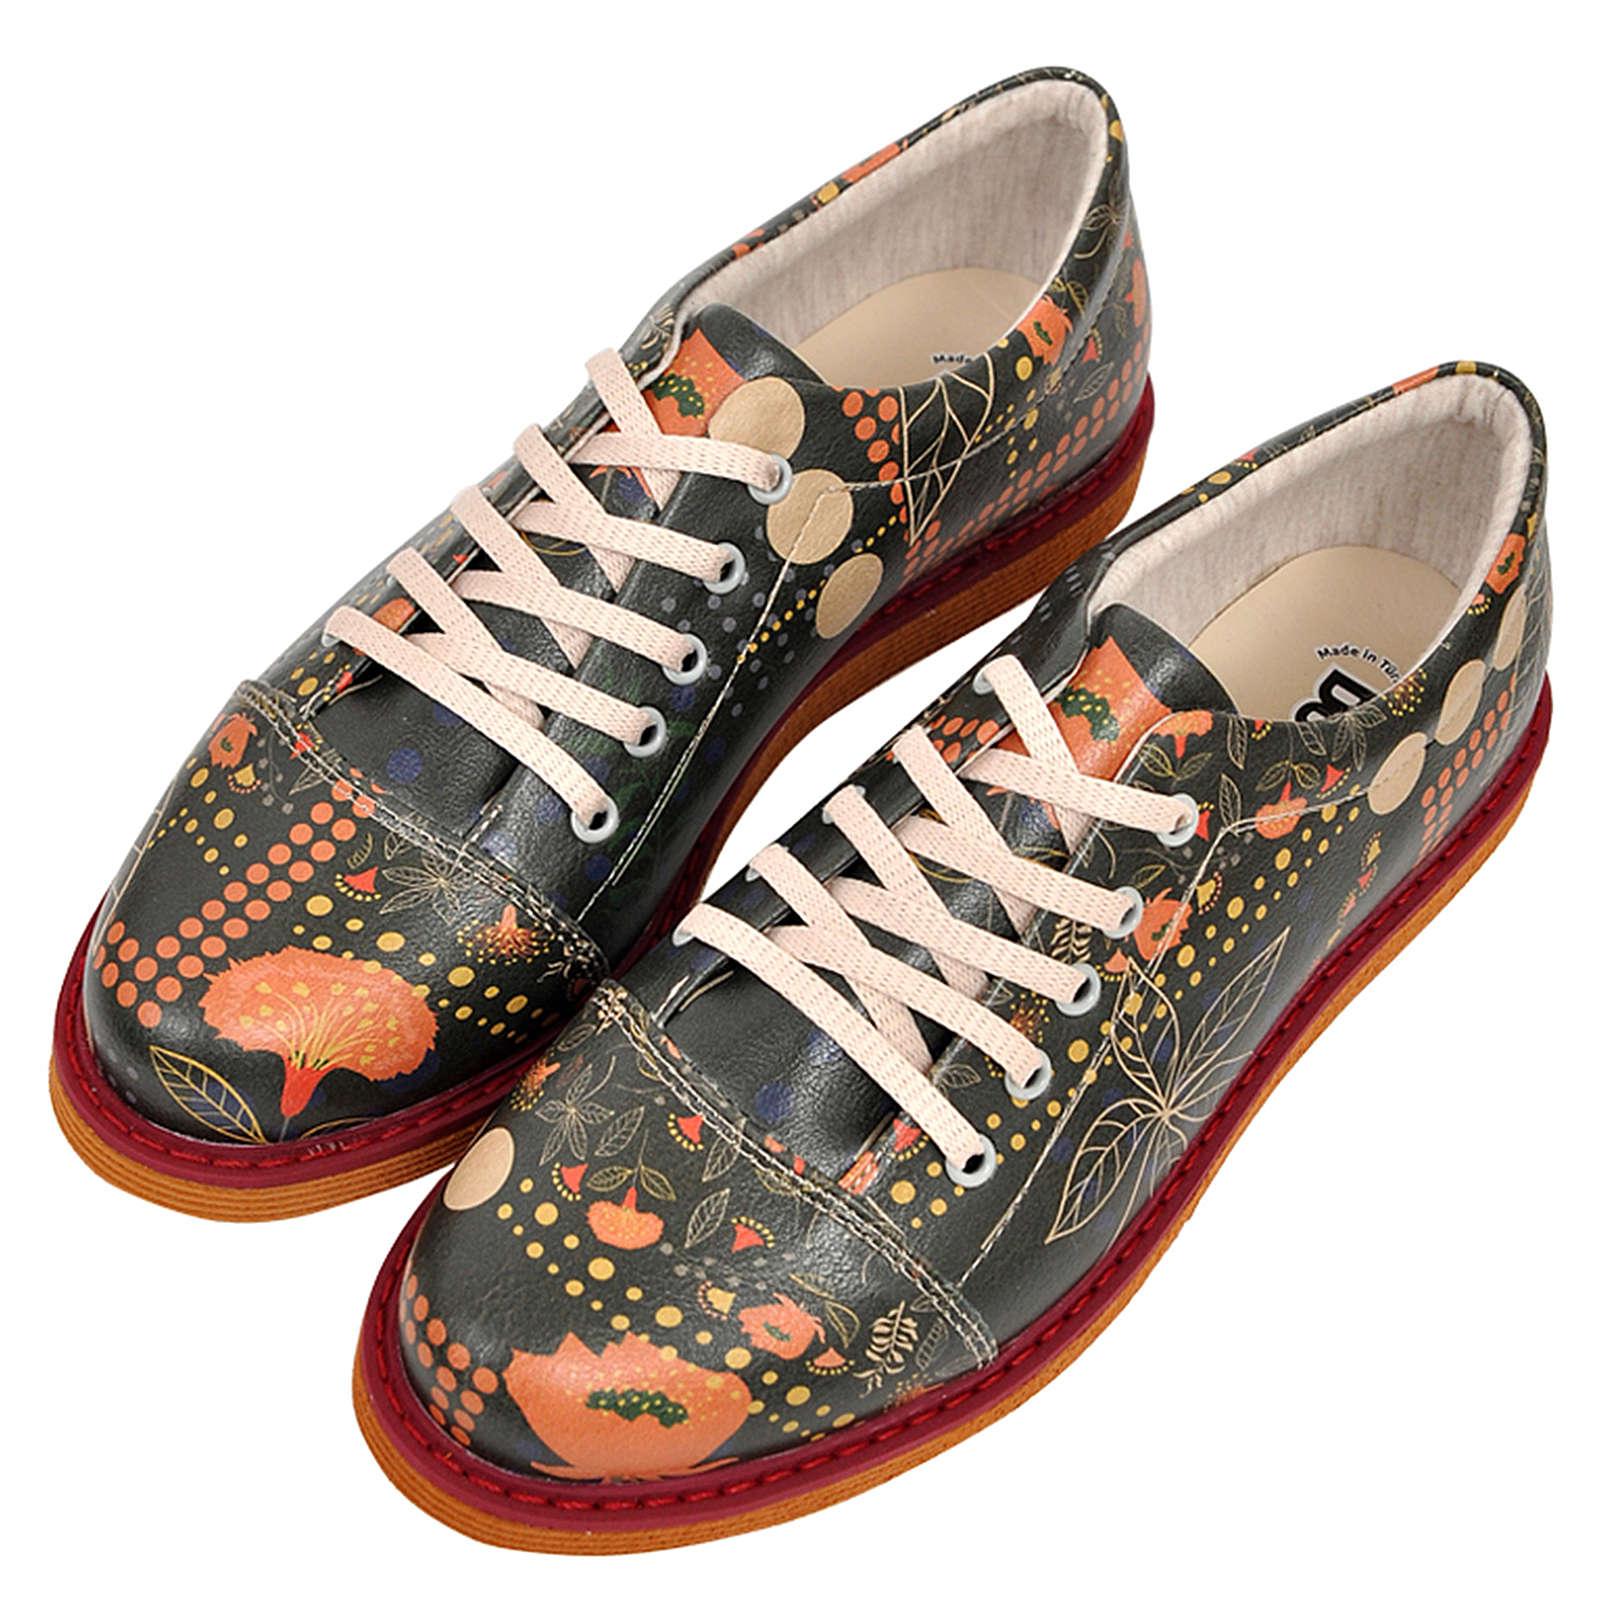 Dogo Shoes DOGO Broke's Dots&leaves Schnürschuhe schwarz Damen Gr. 36